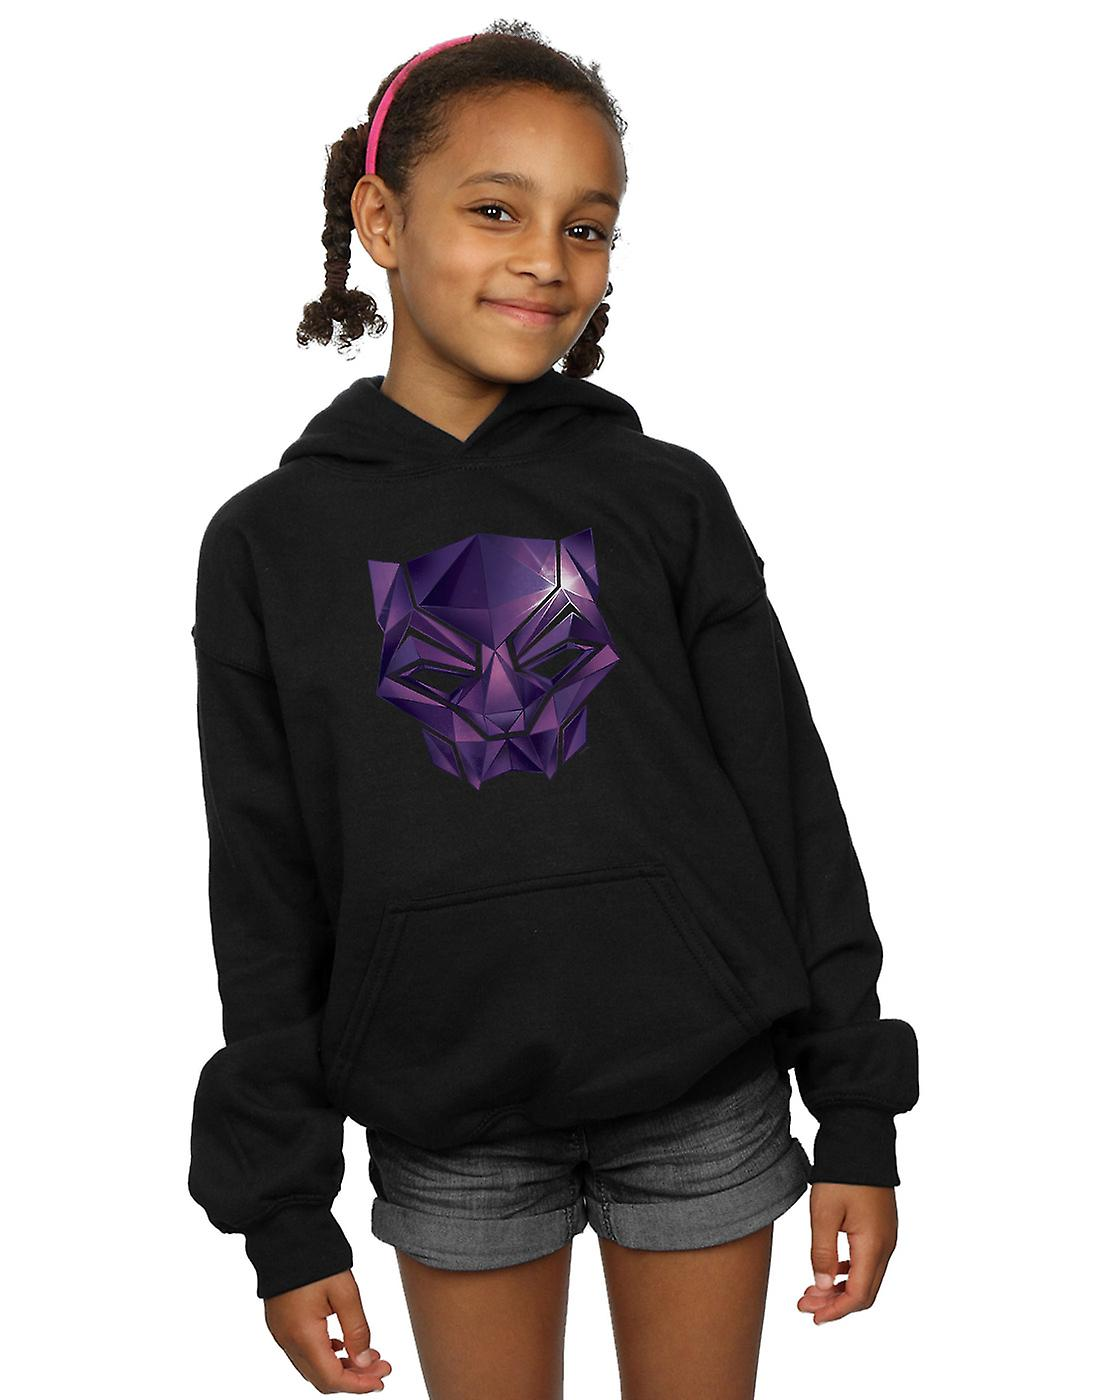 Marvel Girls Avengers Infinity War Black Panther Geometric Hoodie